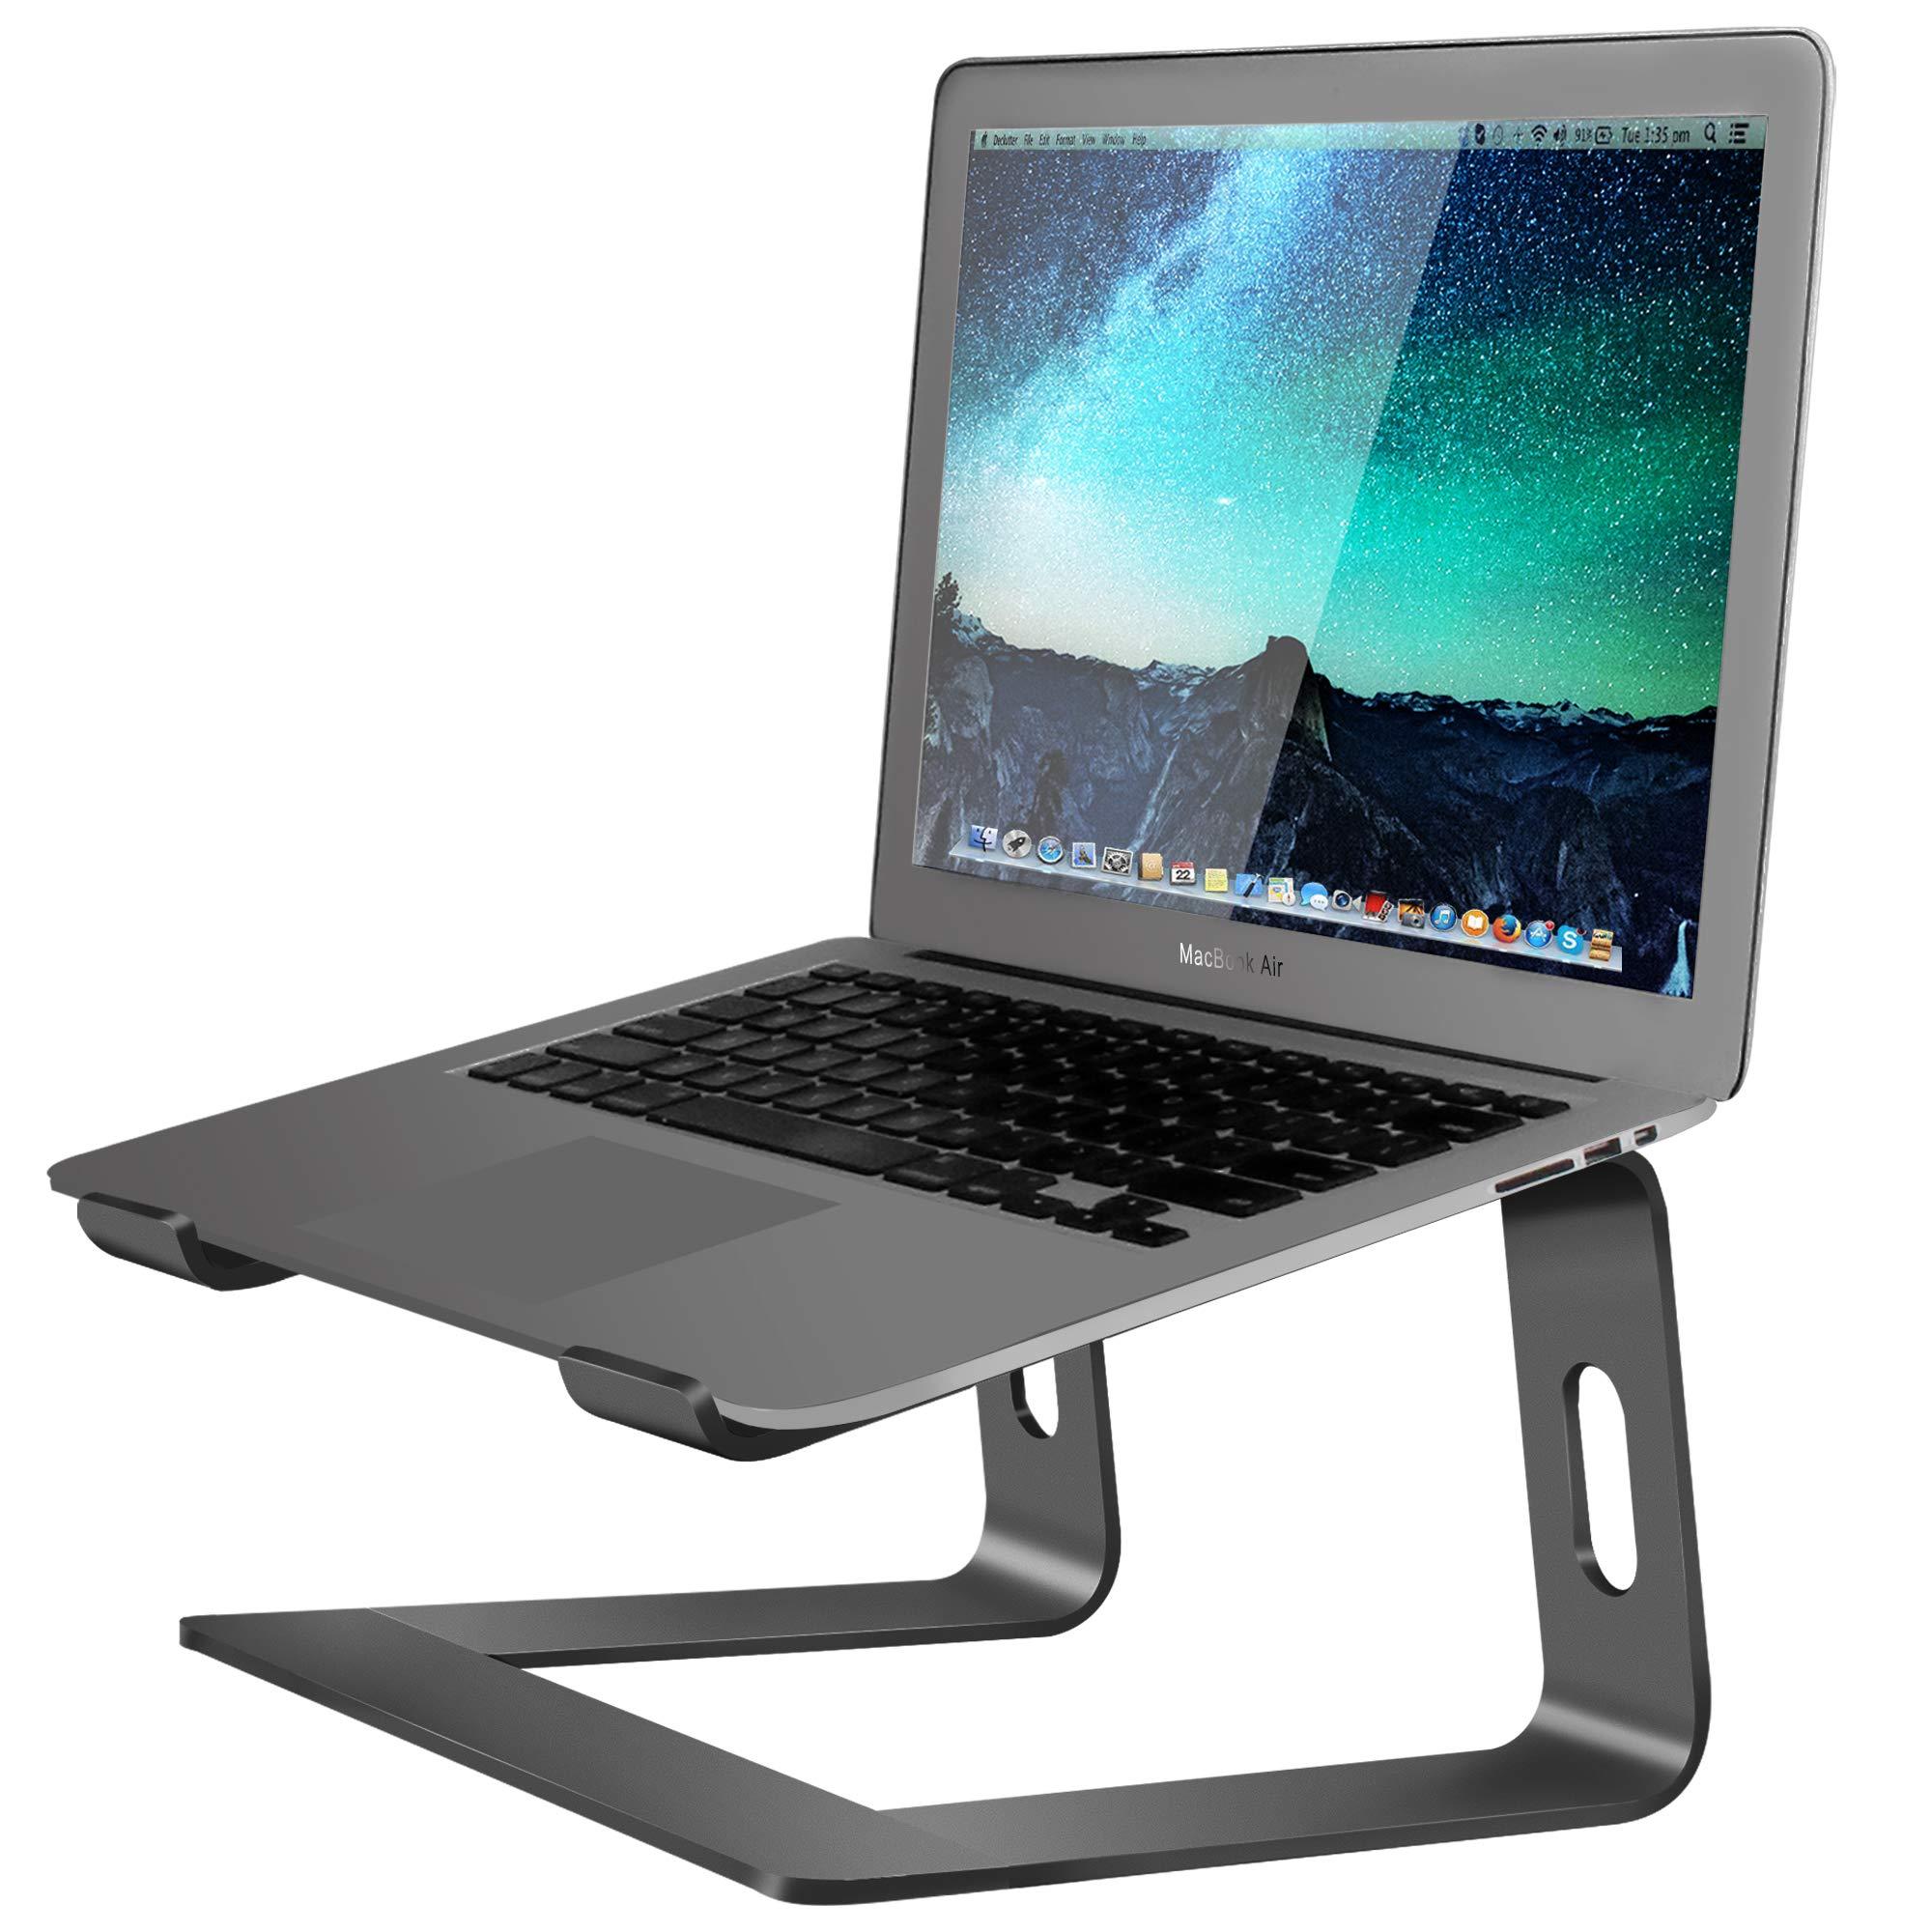 Soundance Aluminum Laptop Stand for Desk Compatible with Mac MacBook Pro Air Apple Notebook, Portable Holder Ergonomic Elevator Metal Riser for 10 to 15.6 inch PC Desktop Computer, LS1 Black by Soundance